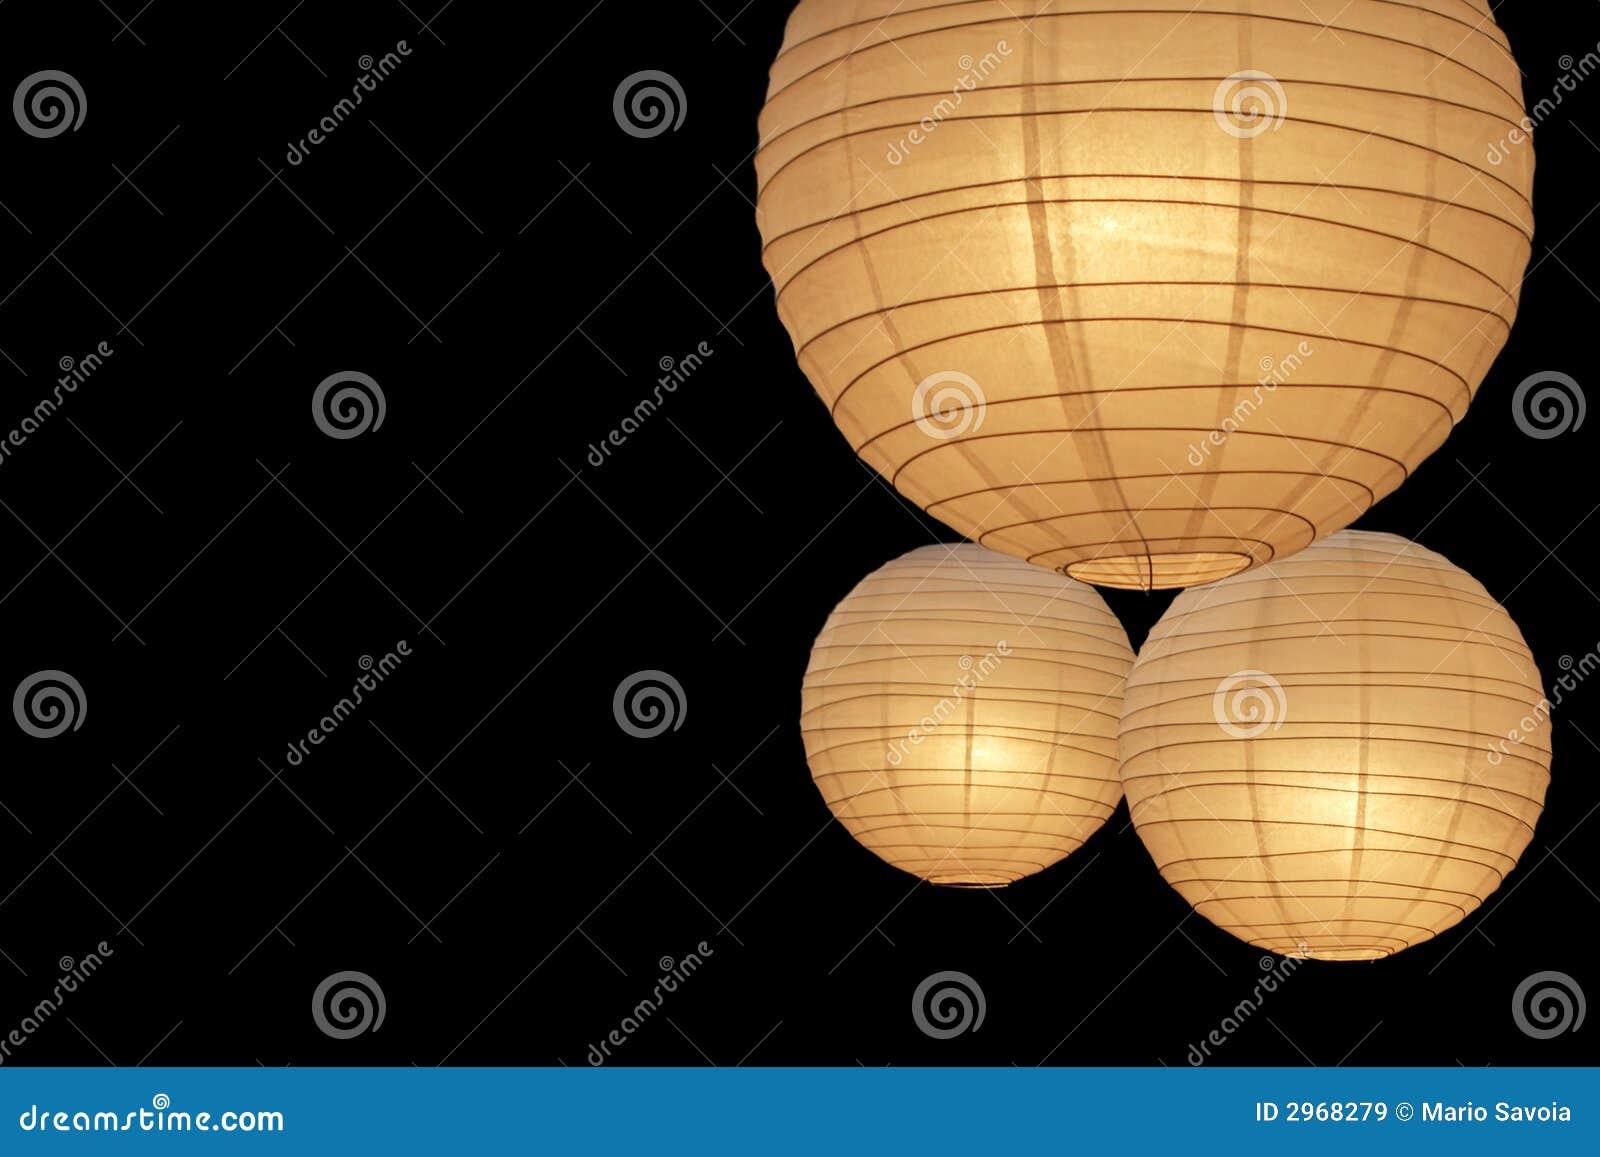 Lampade di carta di riso online u imperdibili lampadari sferici